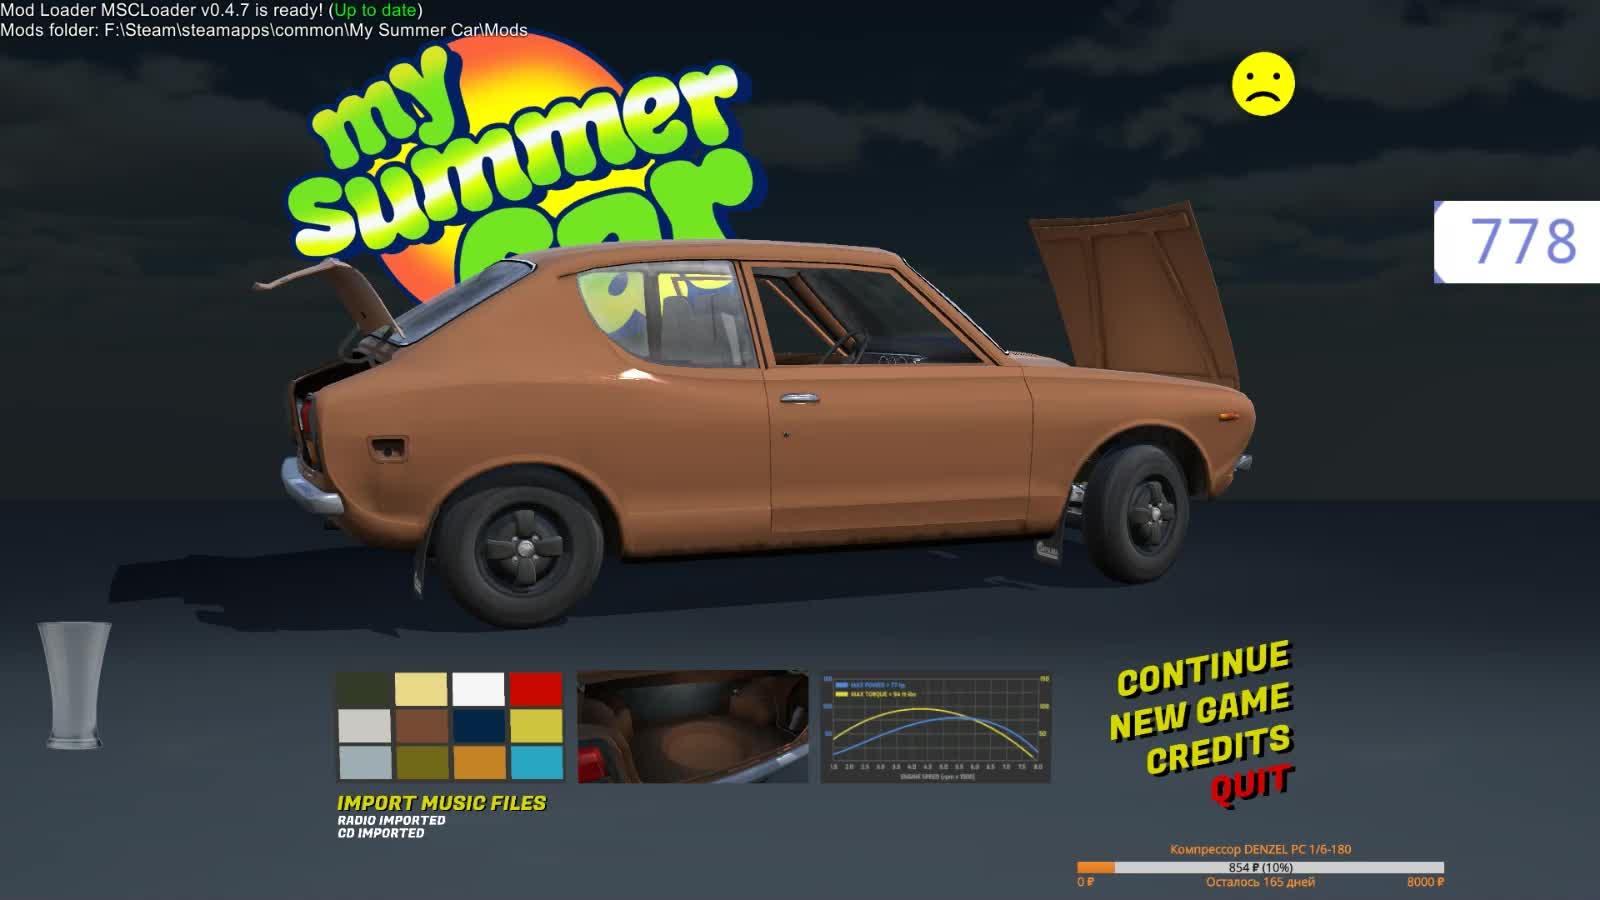 Leo4y - ИГРА My Summer Car МЕЛКИЕ ДОДЕЛКИ И ПОКАТУШКИ - Twitch